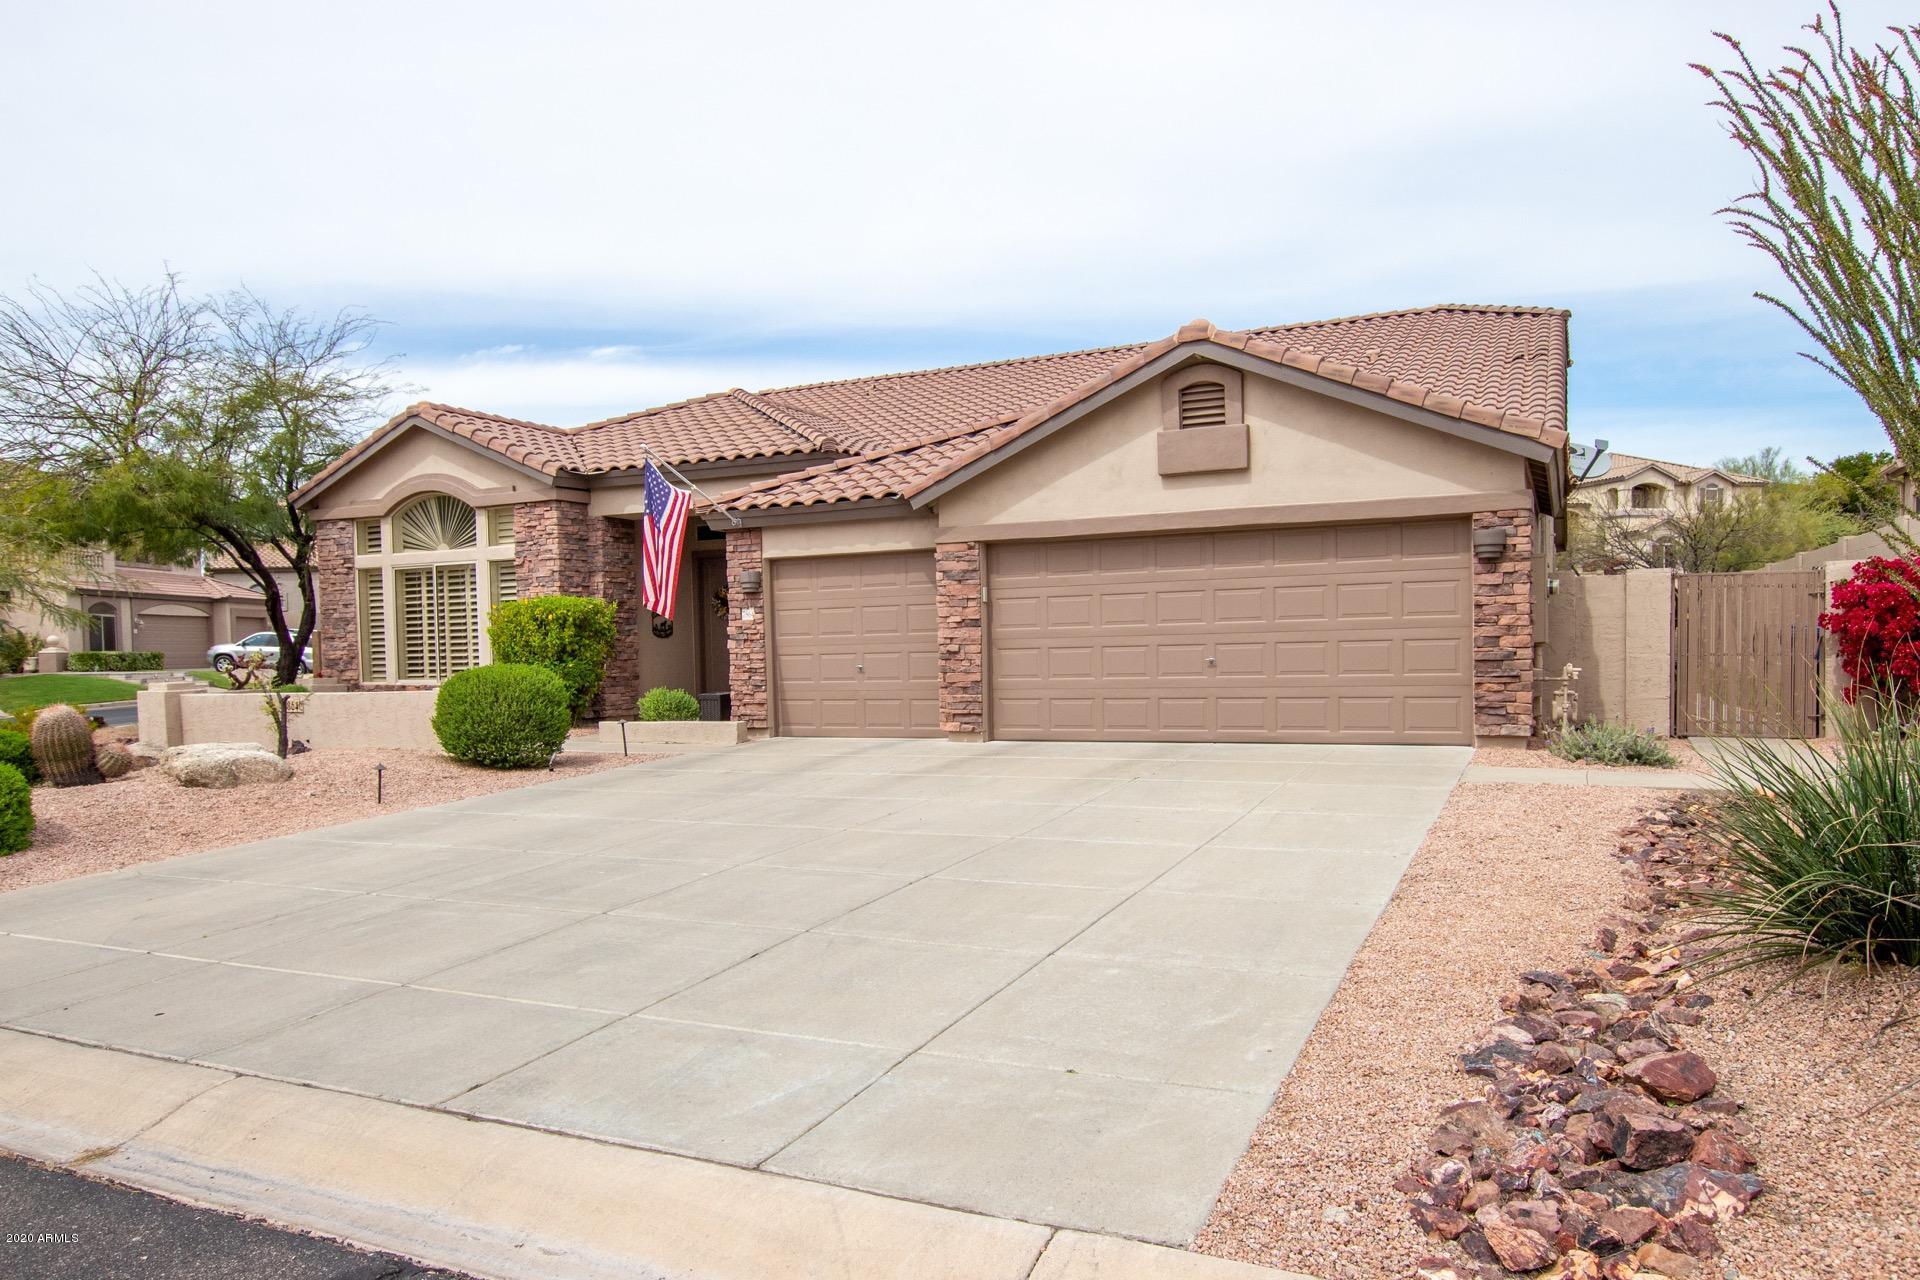 Photo of 7864 E SIERRA MORENA Circle, Mesa, AZ 85207